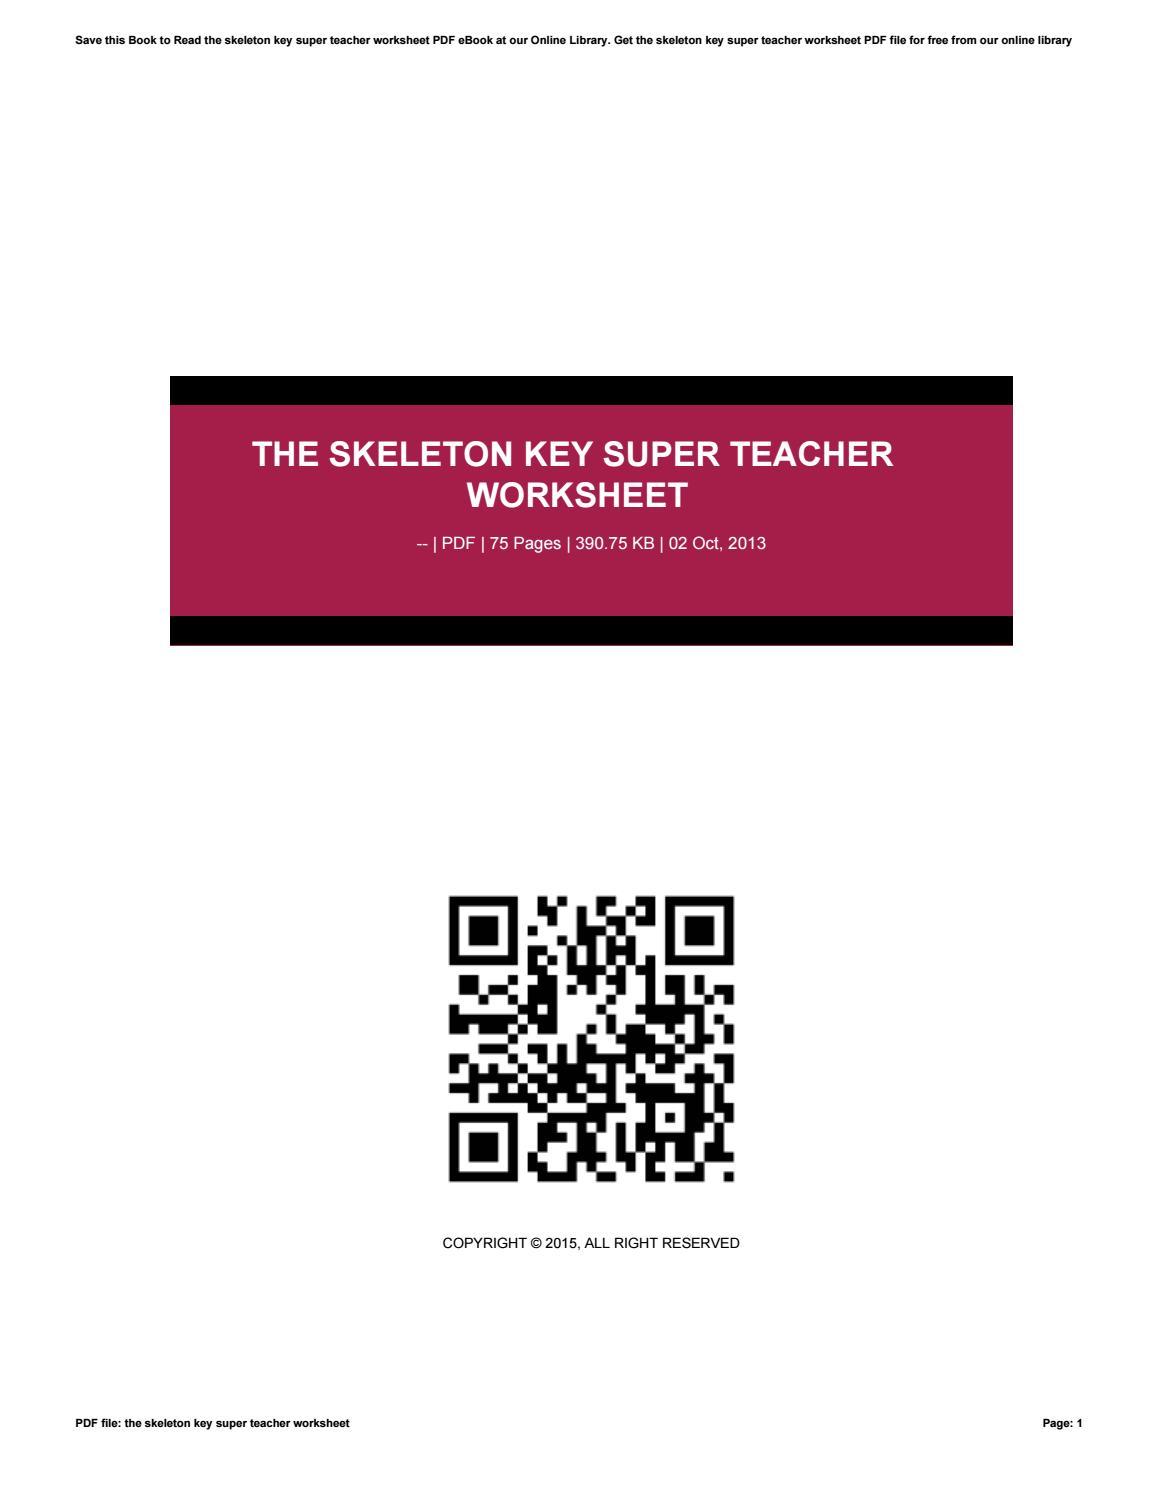 Workbooks super teacher worksheets pdf : The skeleton key super teacher worksheet by acha61mirera - issuu